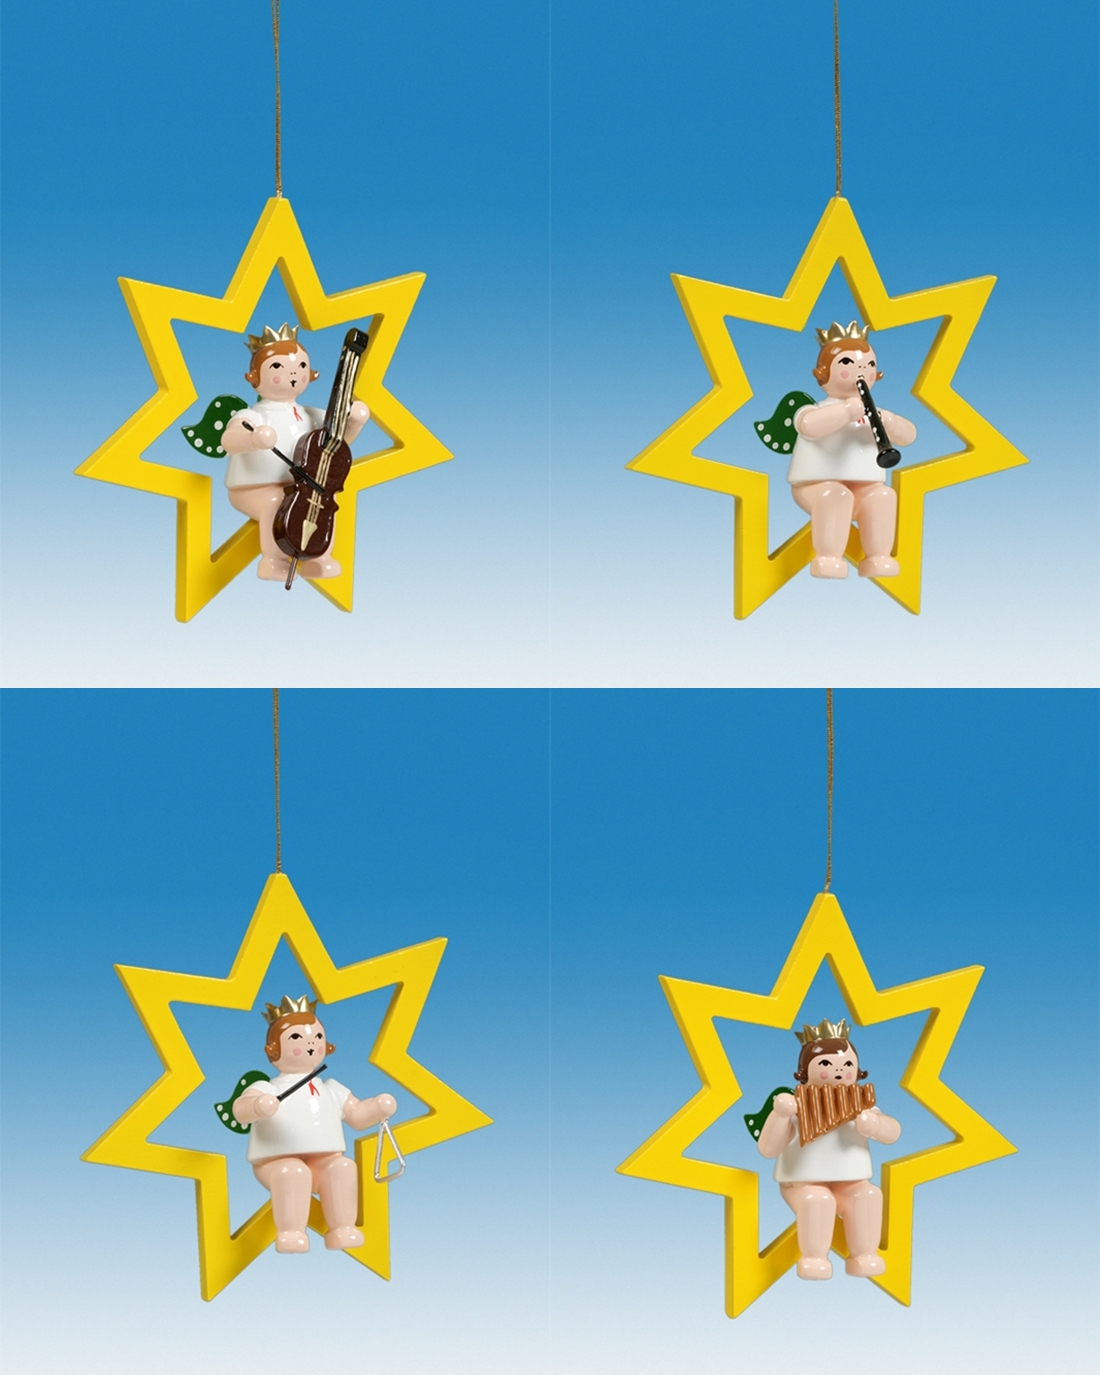 Baumbehang 4-teilig / Engel im Stern mit Krone Höhe ca 6 cm NEU